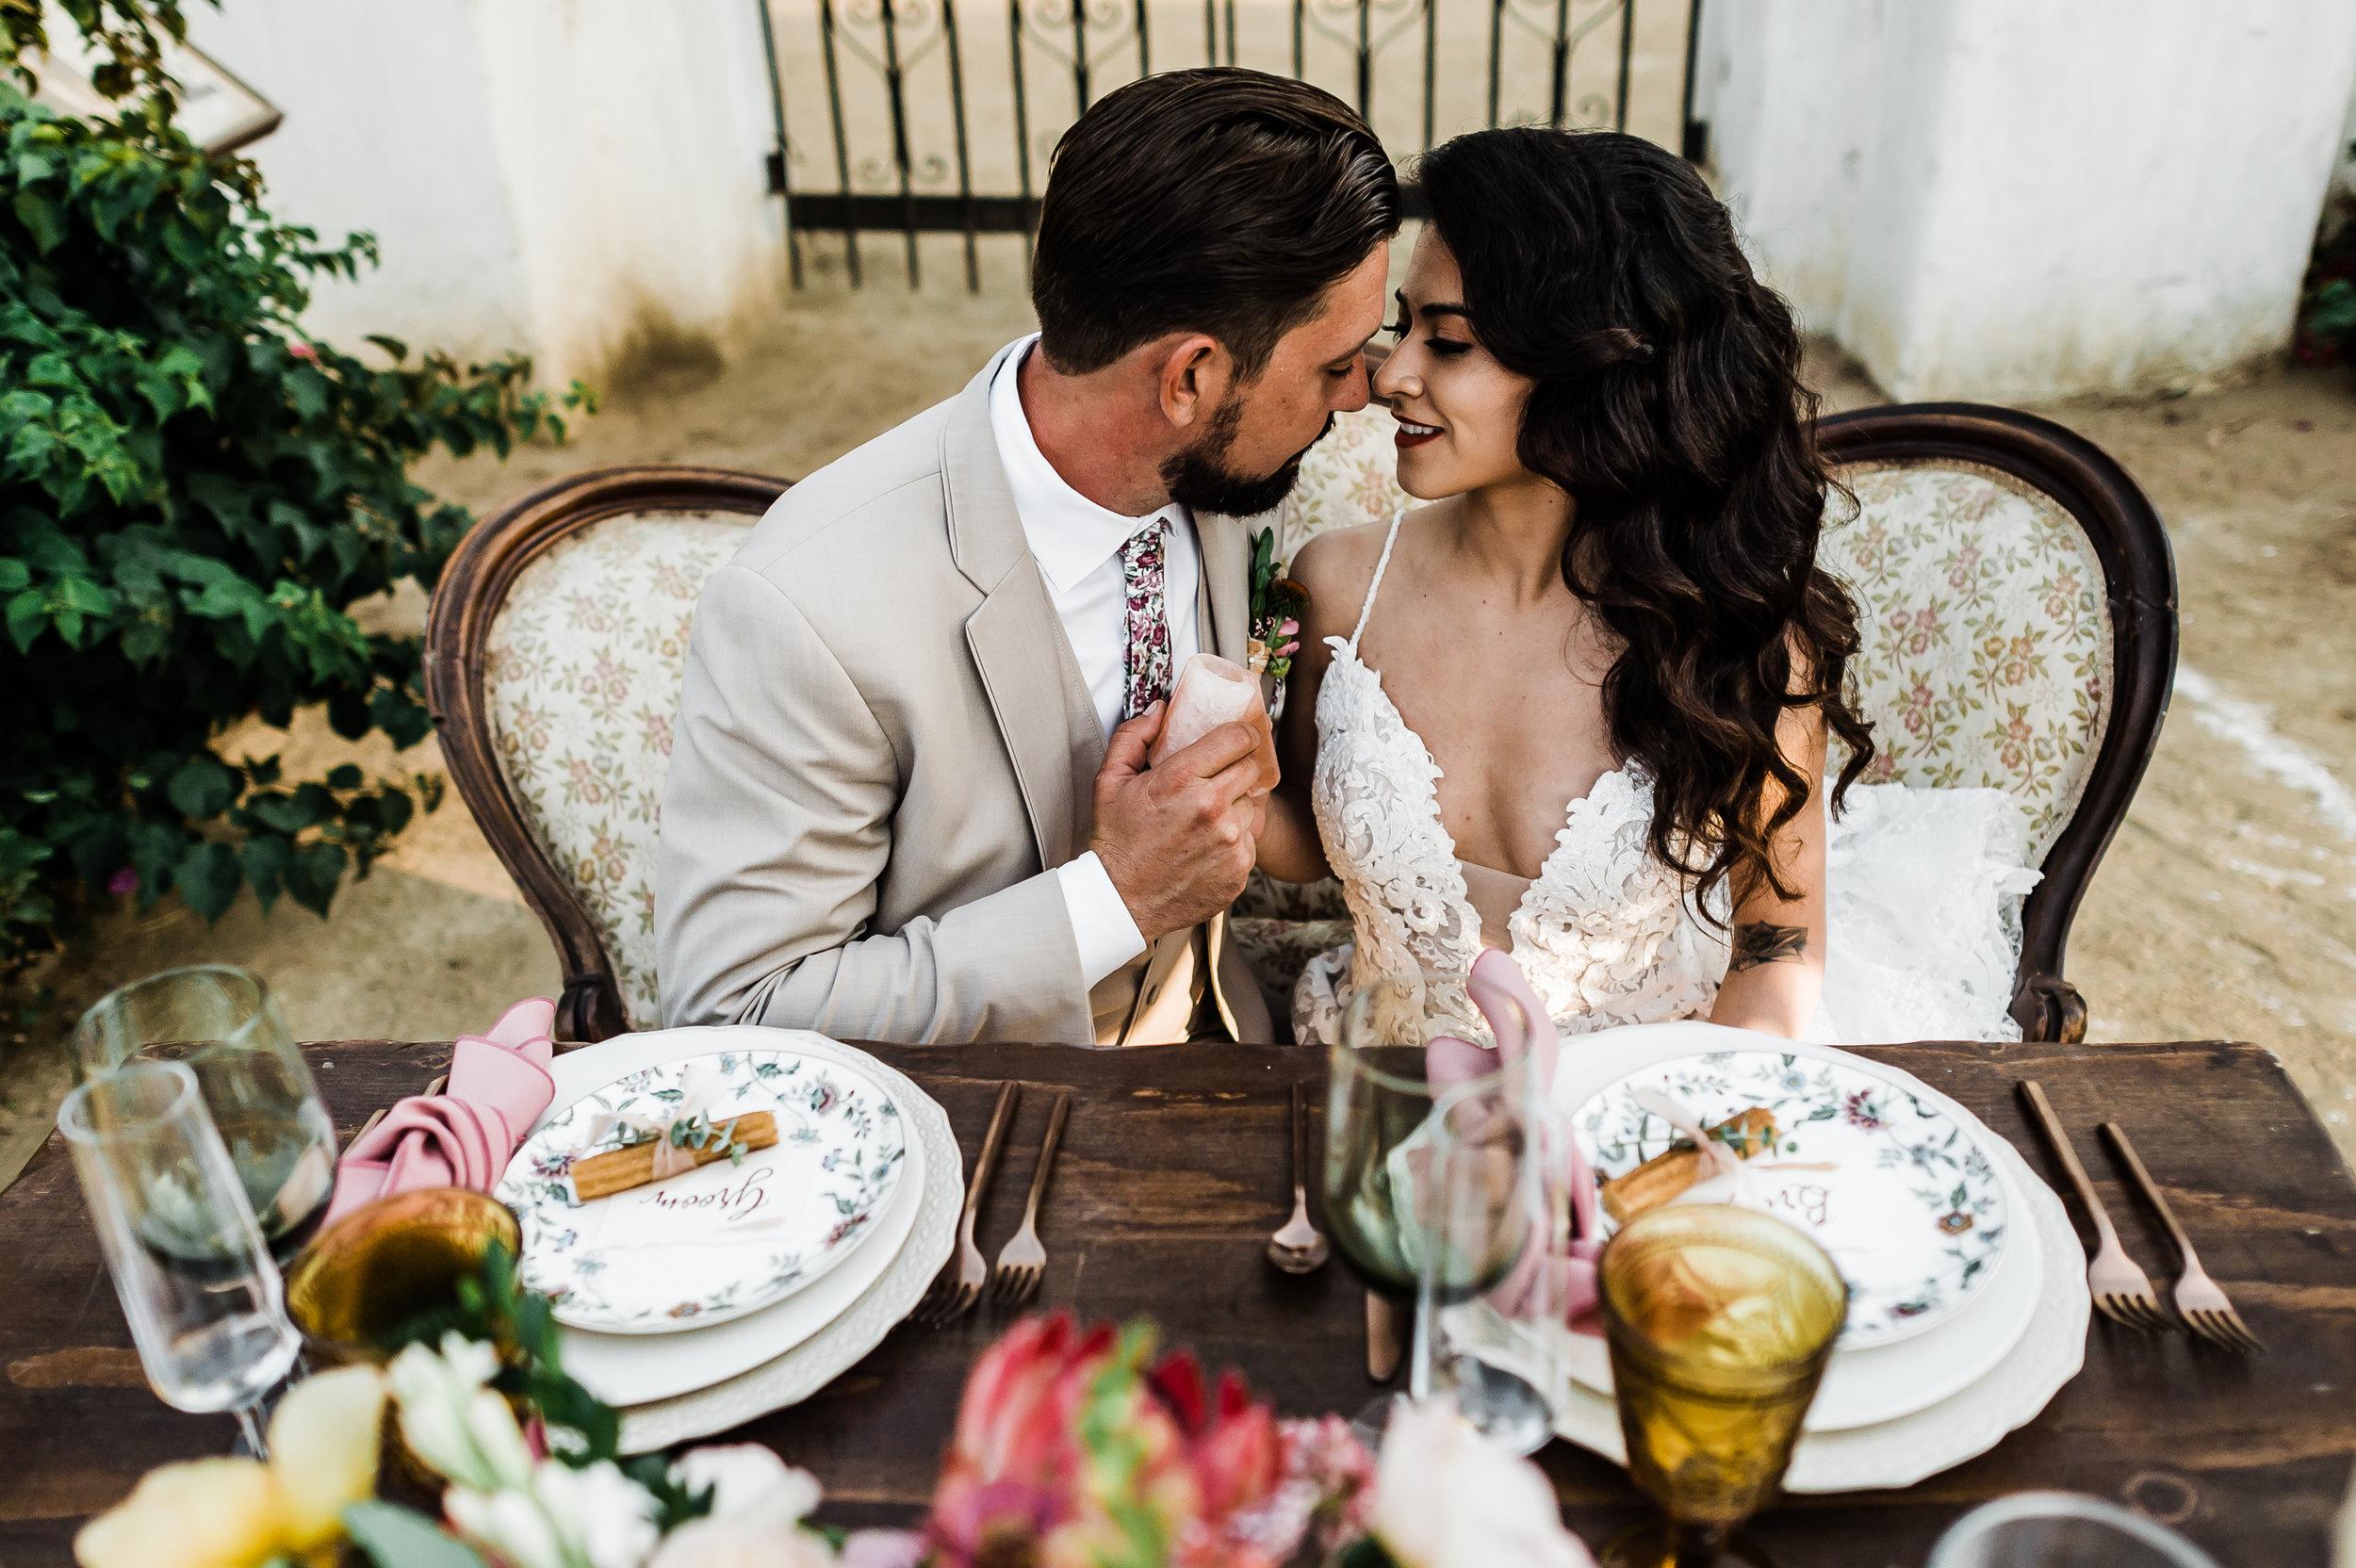 www.santabarbarawedding.com | Michelle Ramirez Photography | Olivas Adobe | Karen Marie Events | Tangled Lotus | Amigo Party Rentals | Bride and Groom at the Reception